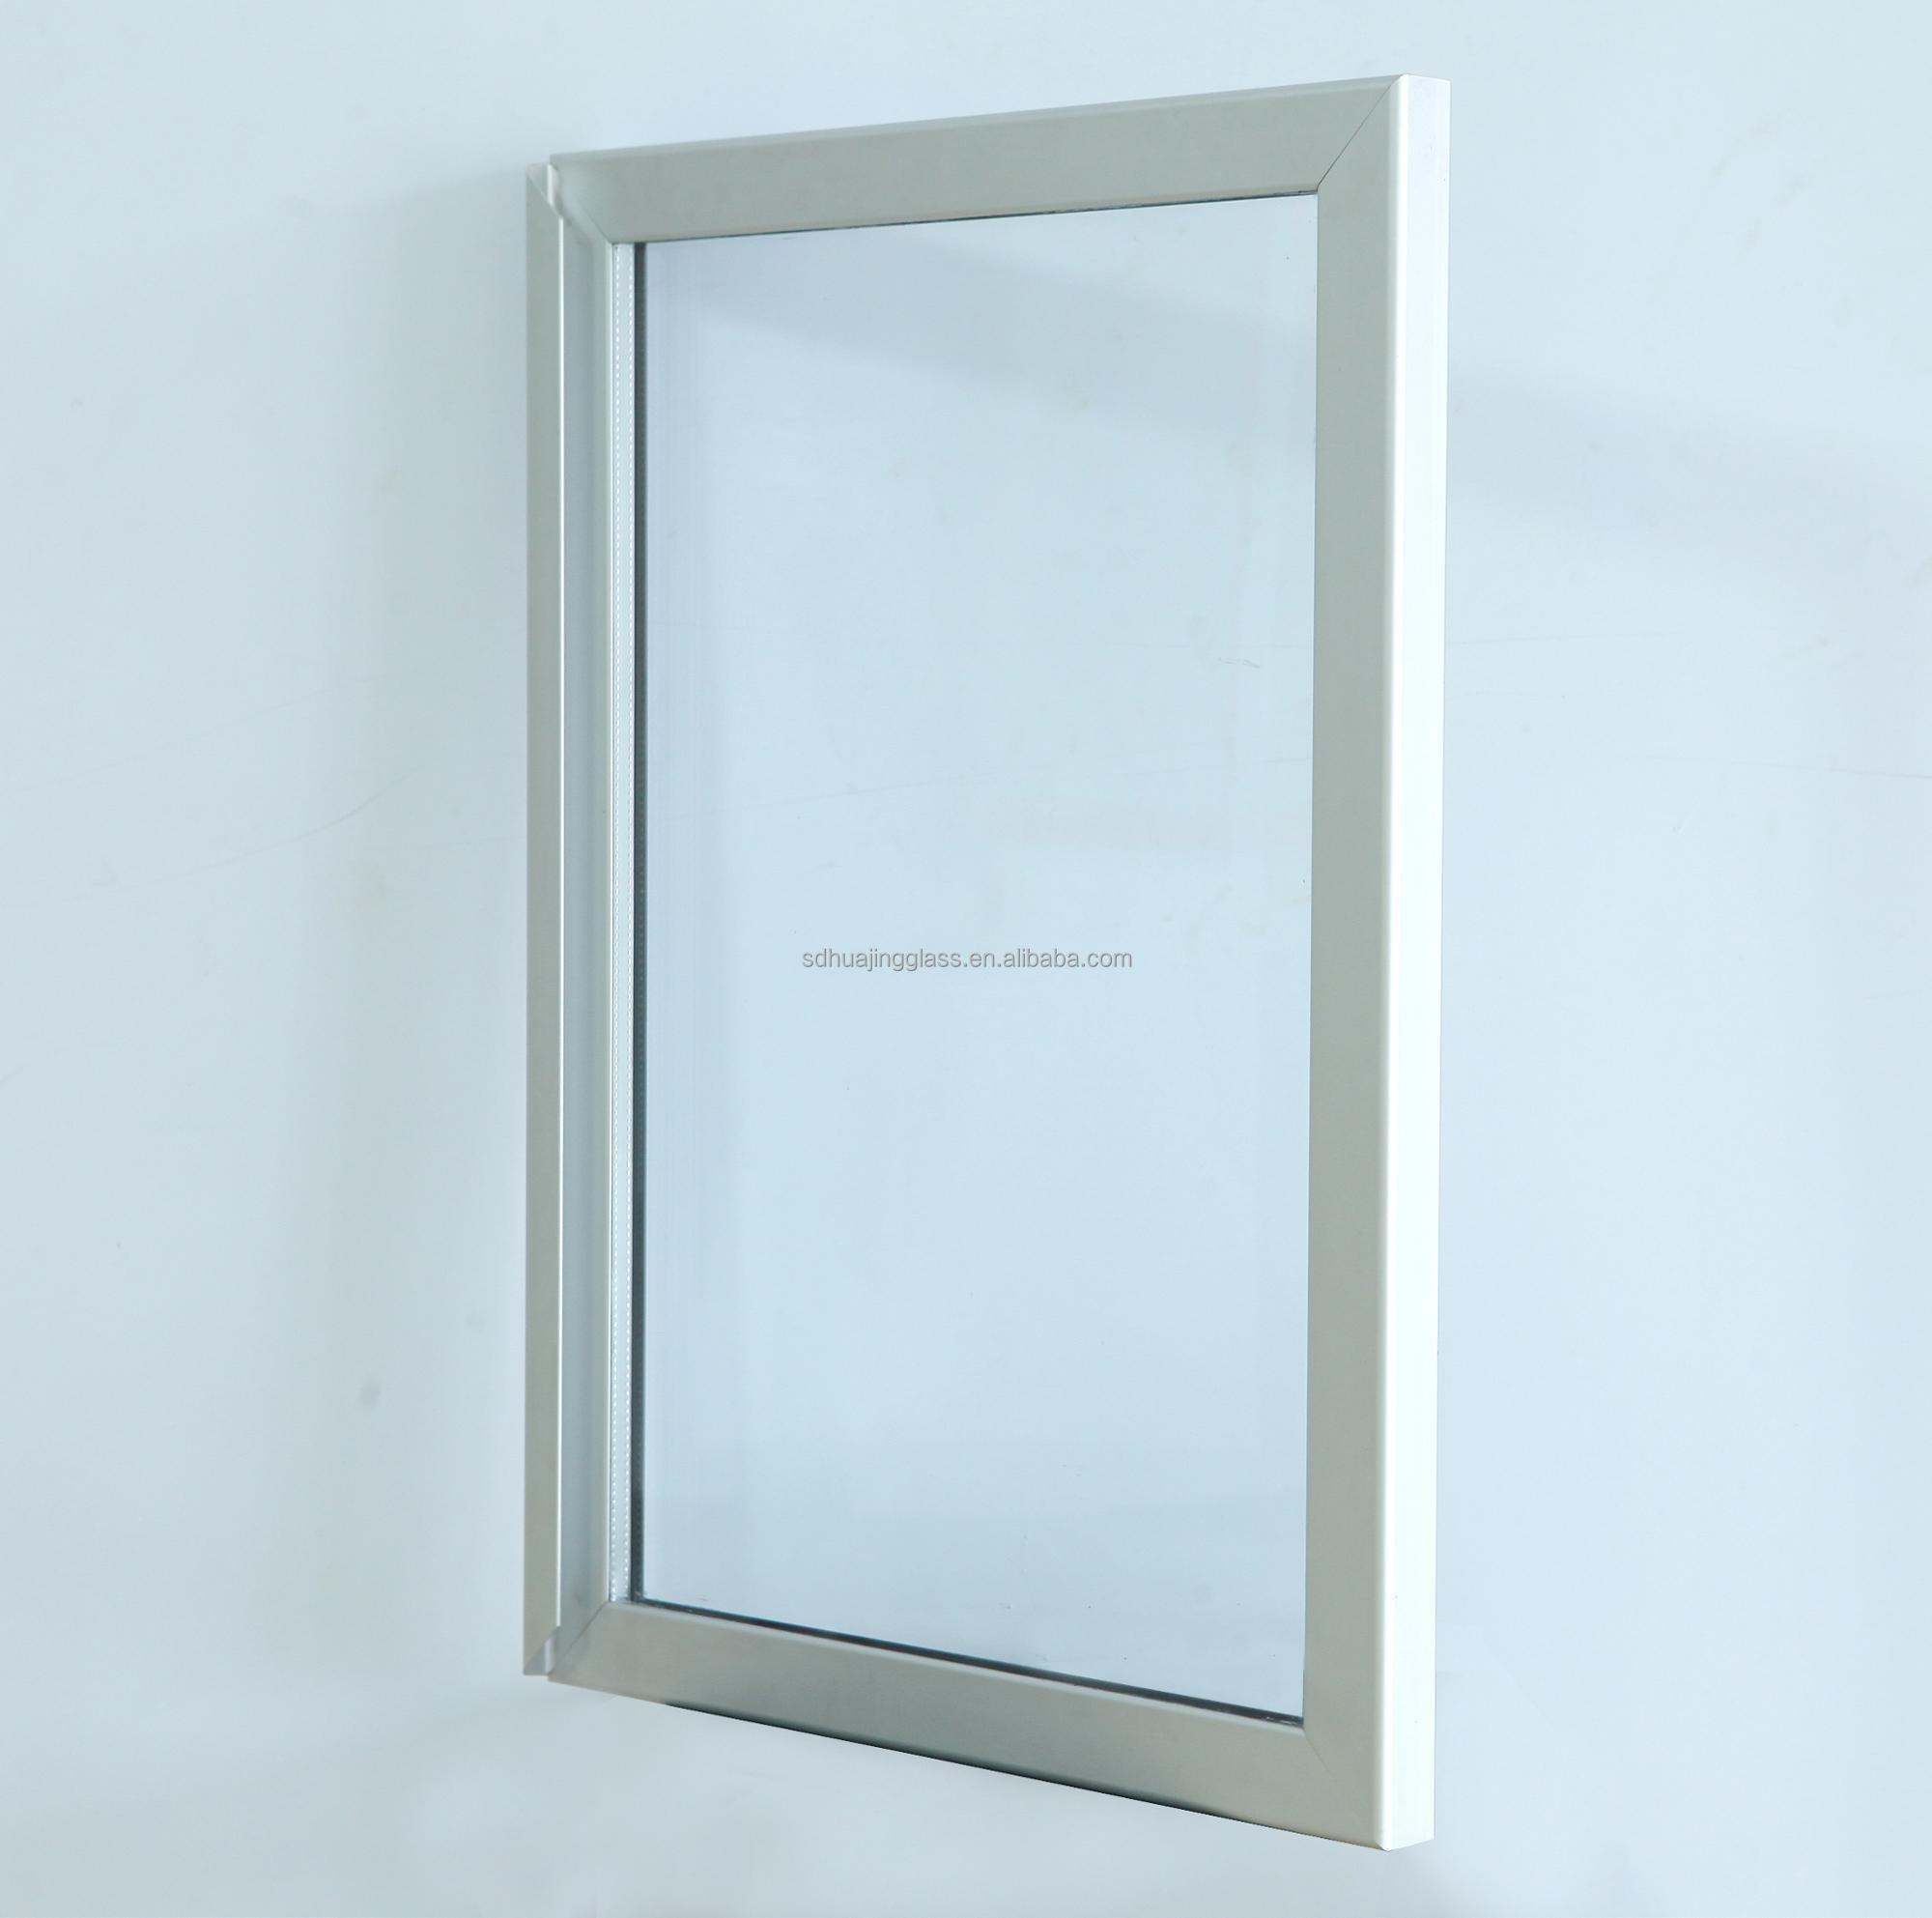 product two fridge bar skipio refrigerator mrce countertop door back display